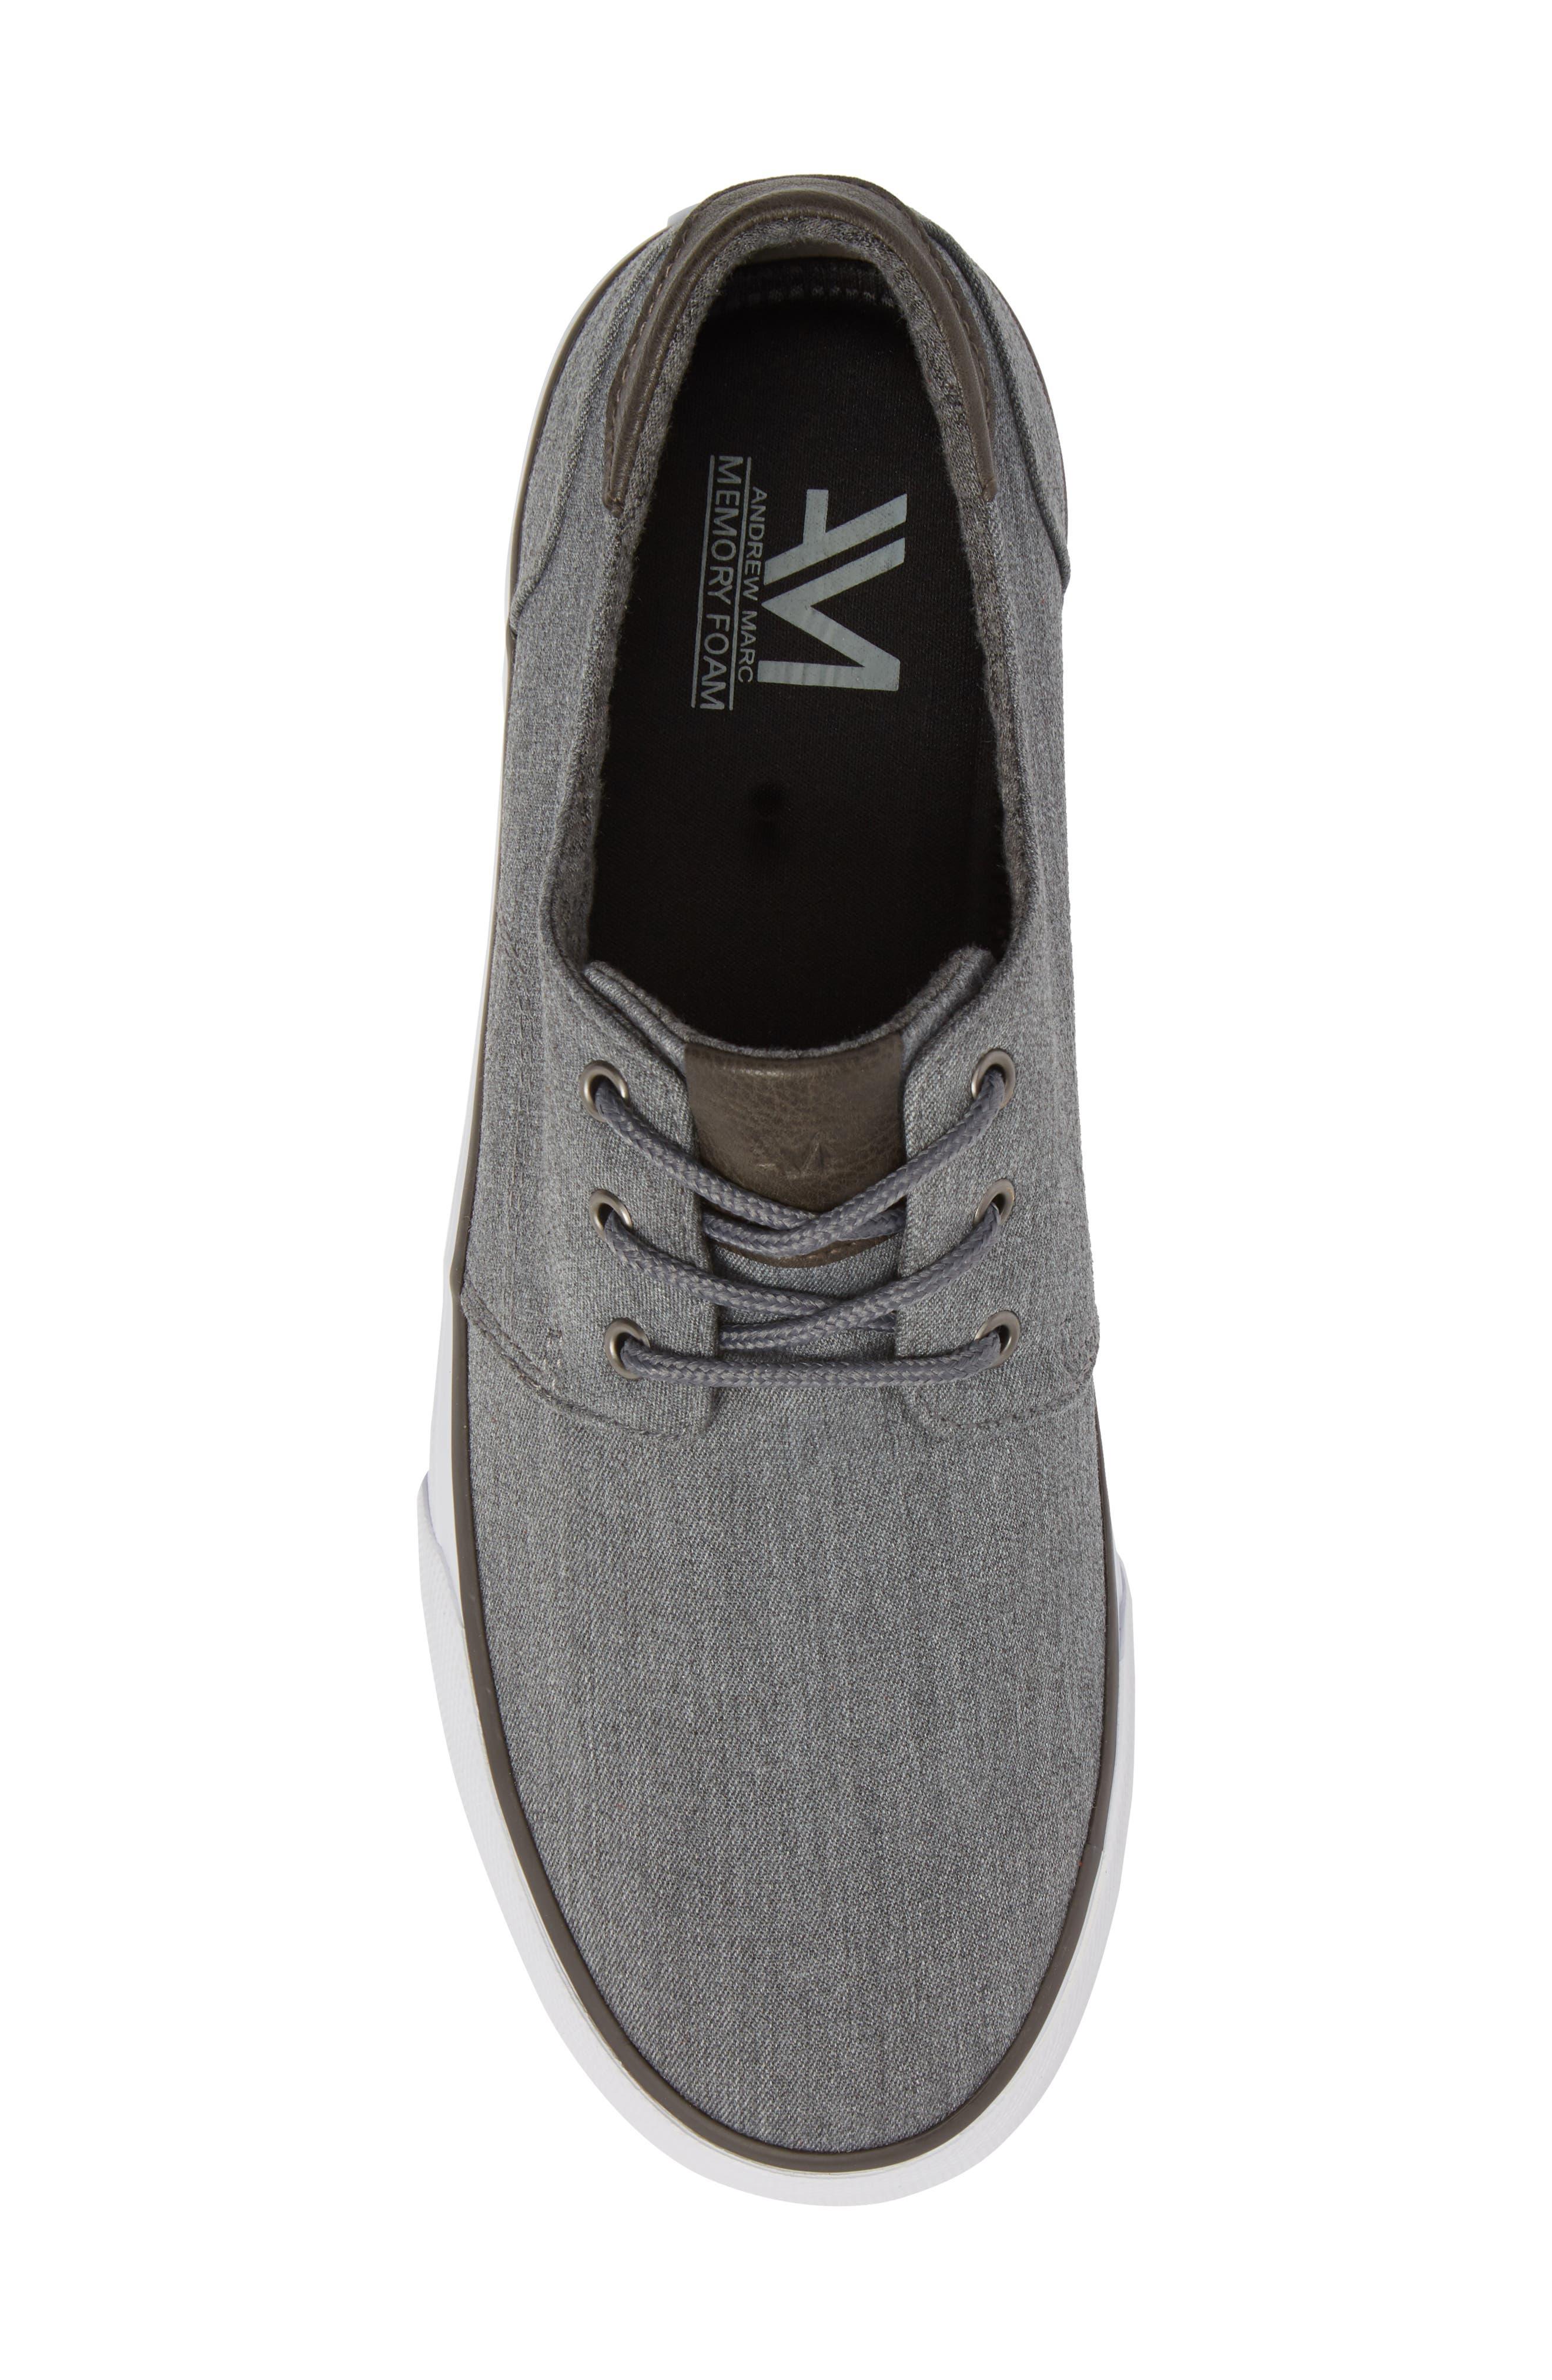 Briggs Low Top Sneaker,                             Alternate thumbnail 5, color,                             CHARCOAL/ DARK GREY/ WHITE